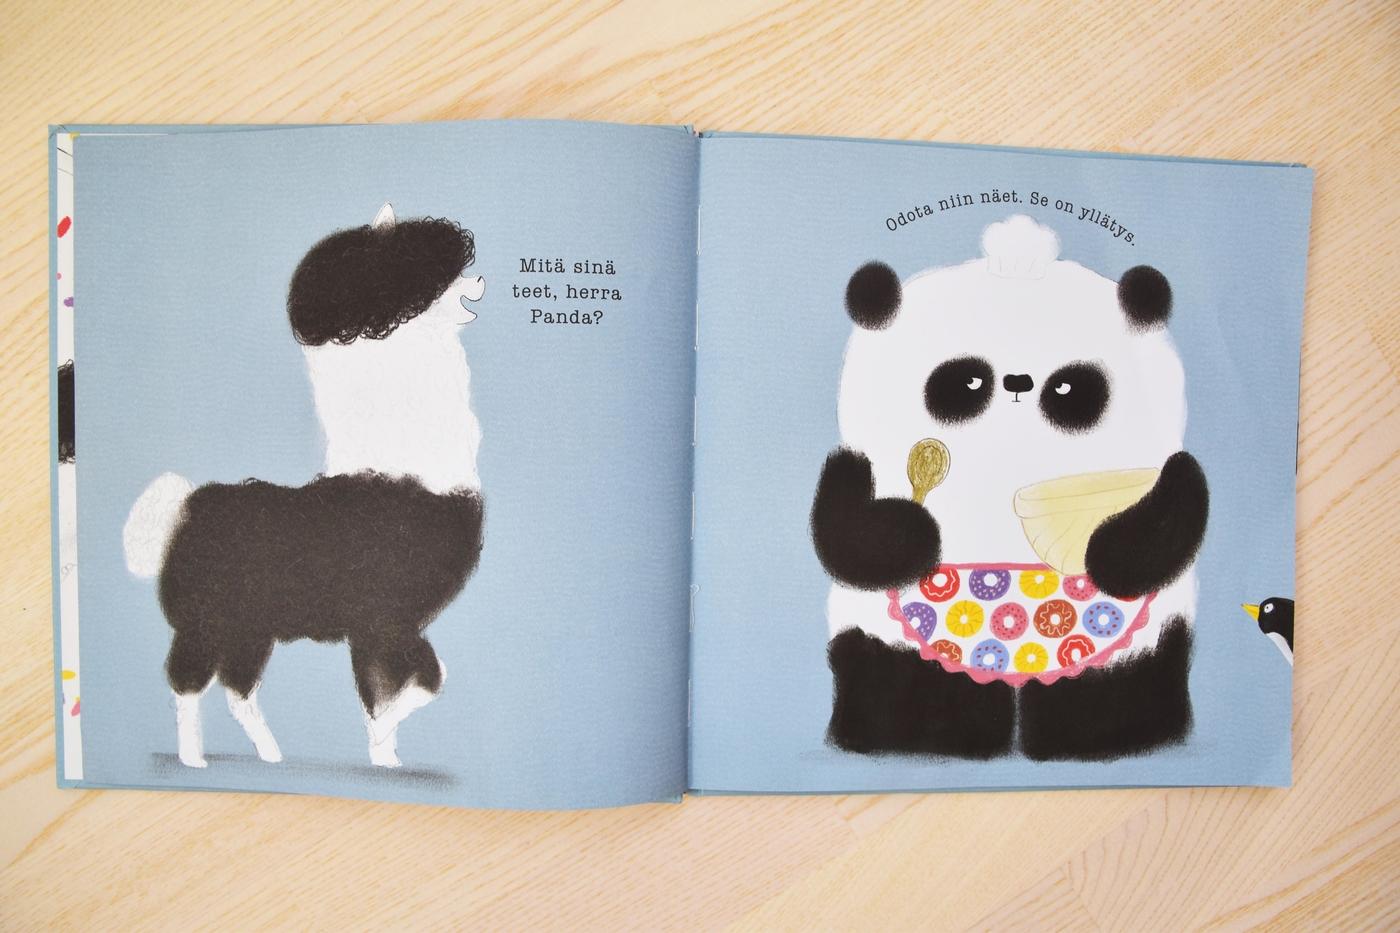 herra panda leipoo2.jpg